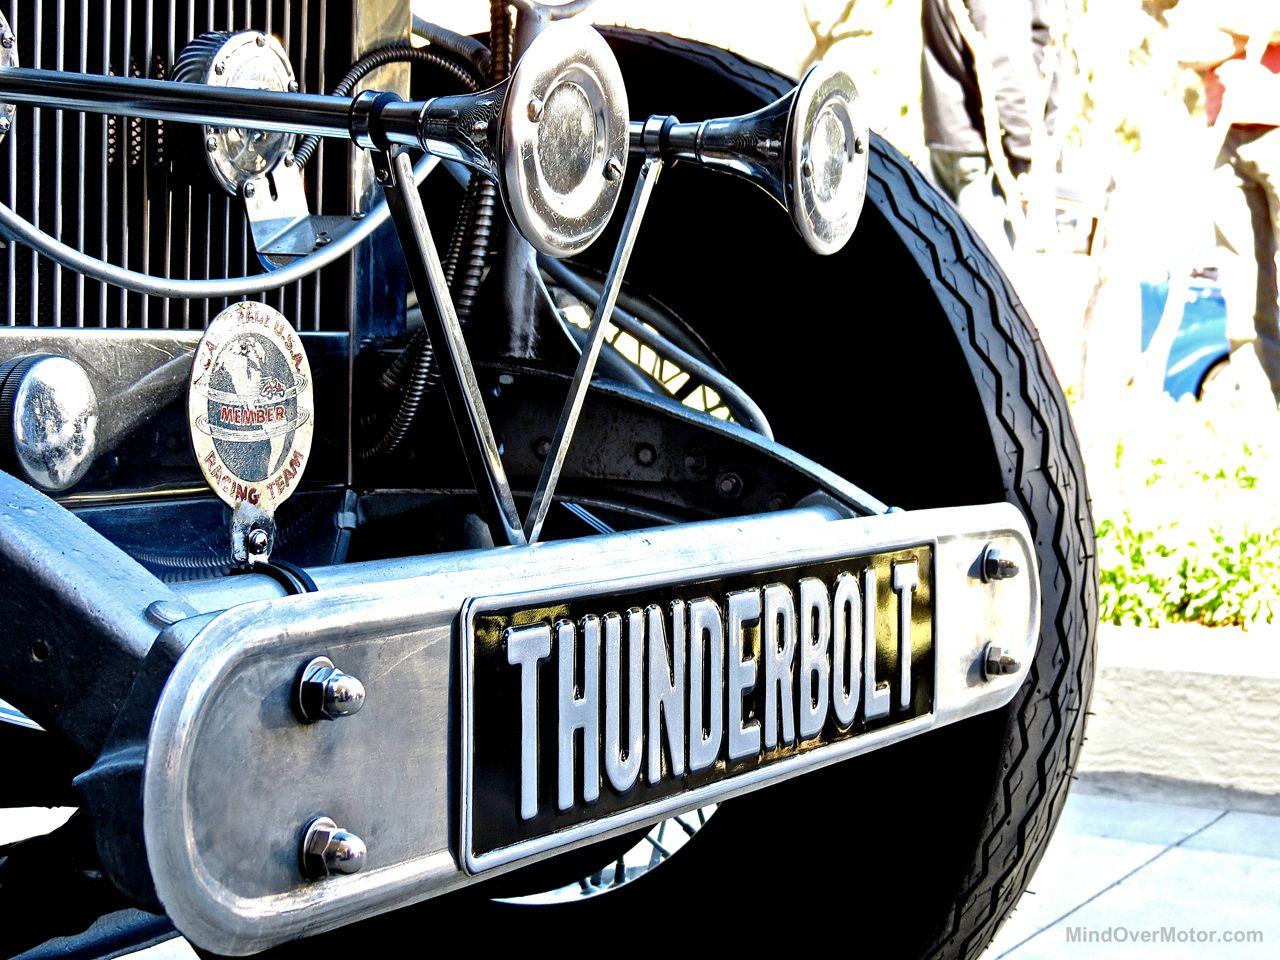 Rolls Royce Thunderbolt V12 Custom Amelia Island 15